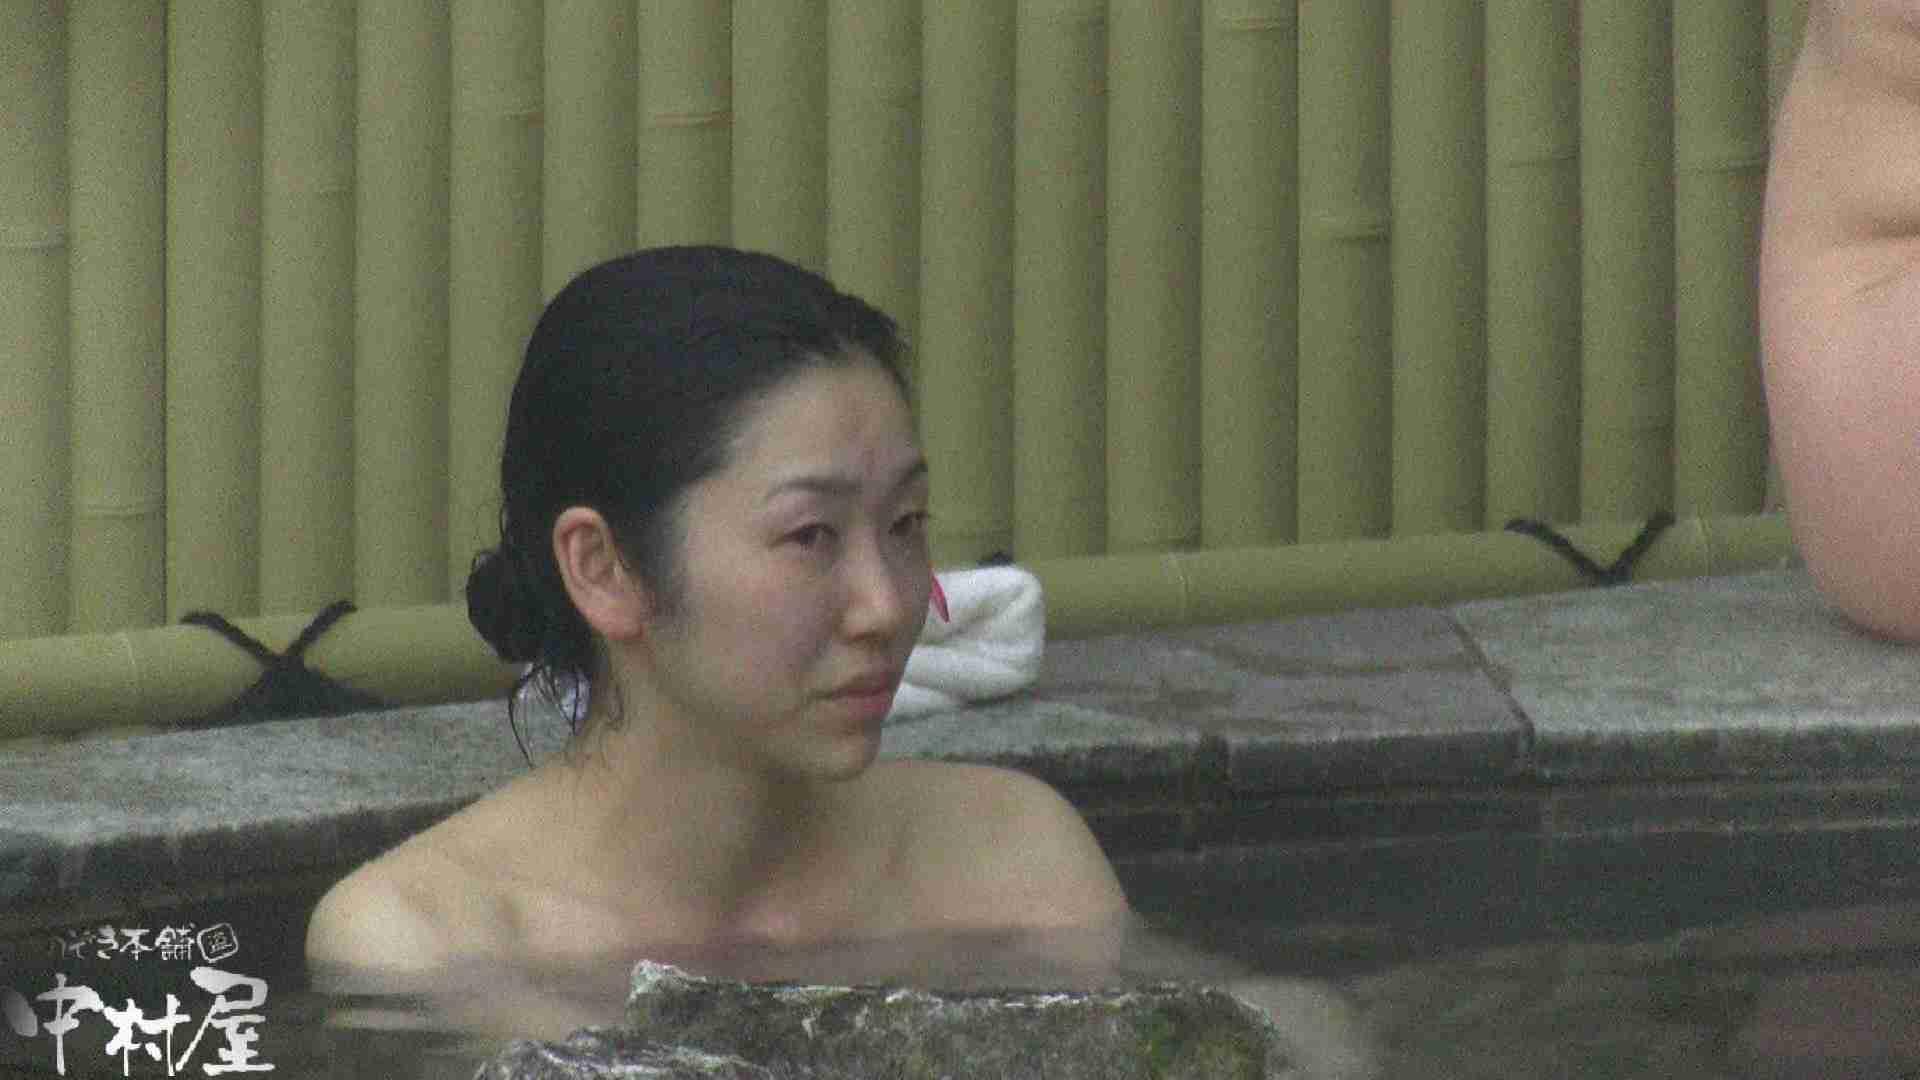 Aquaな露天風呂Vol.917 盗撮シリーズ   露天風呂編  108PIX 45